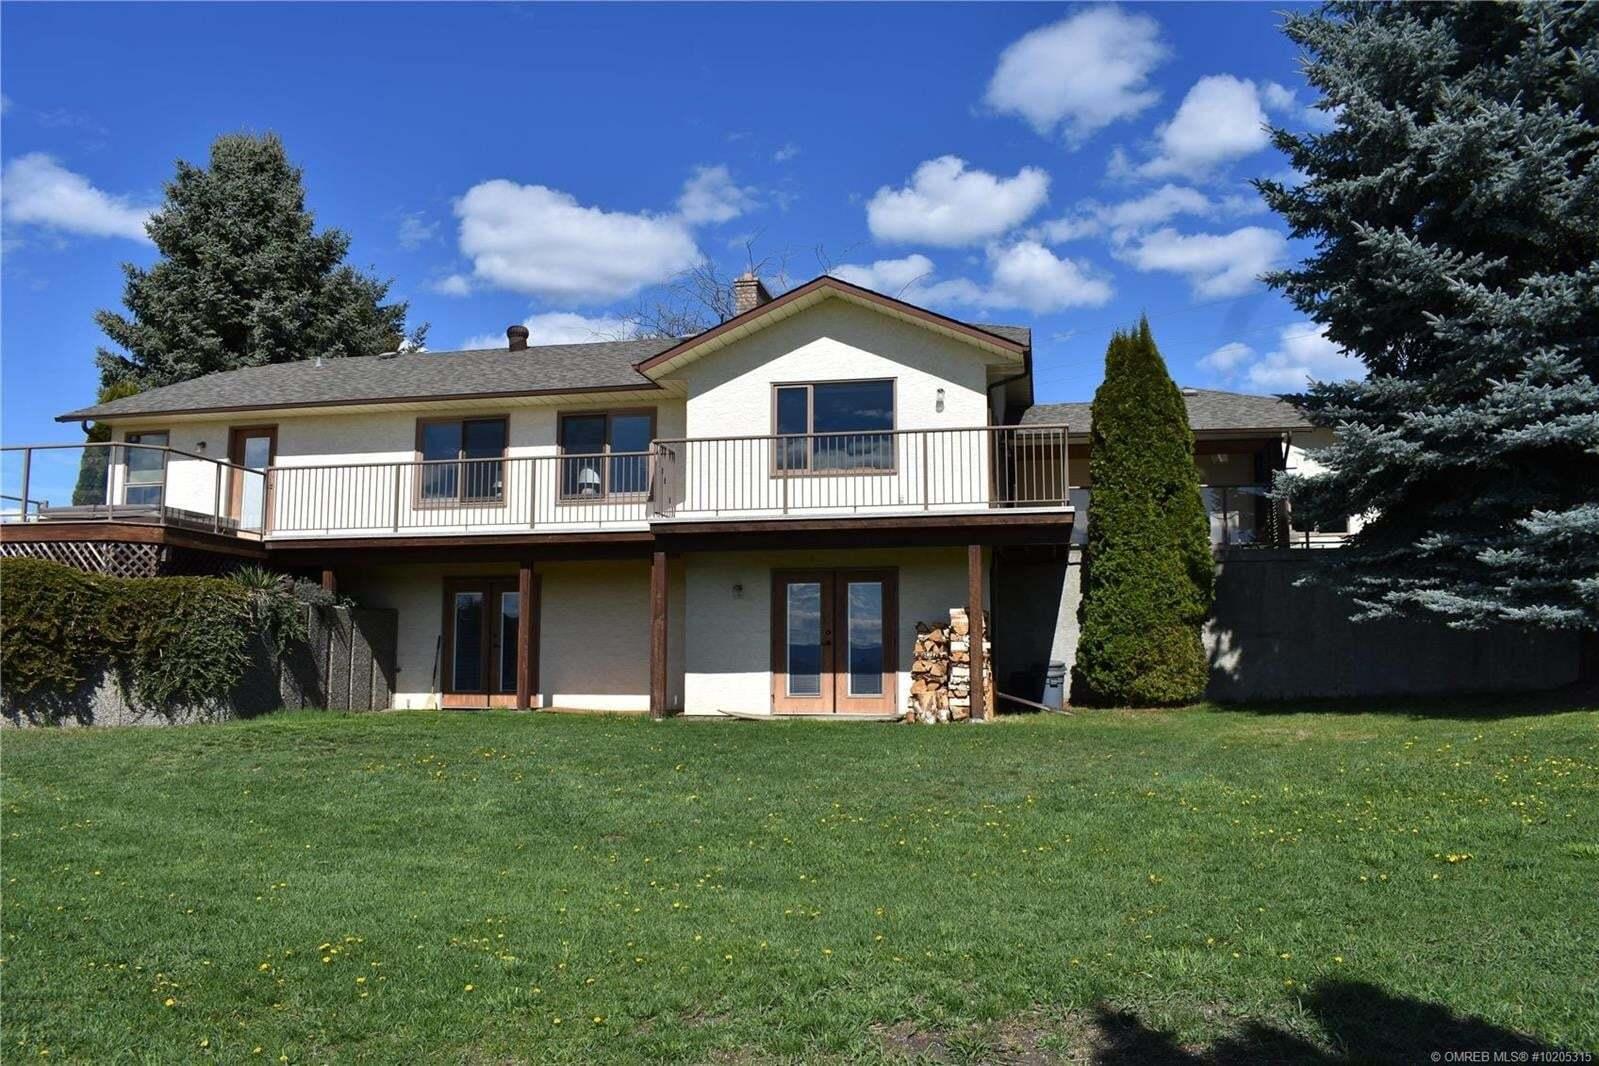 House for sale at 5448 Dixon Dam Rd Vernon British Columbia - MLS: 10205315